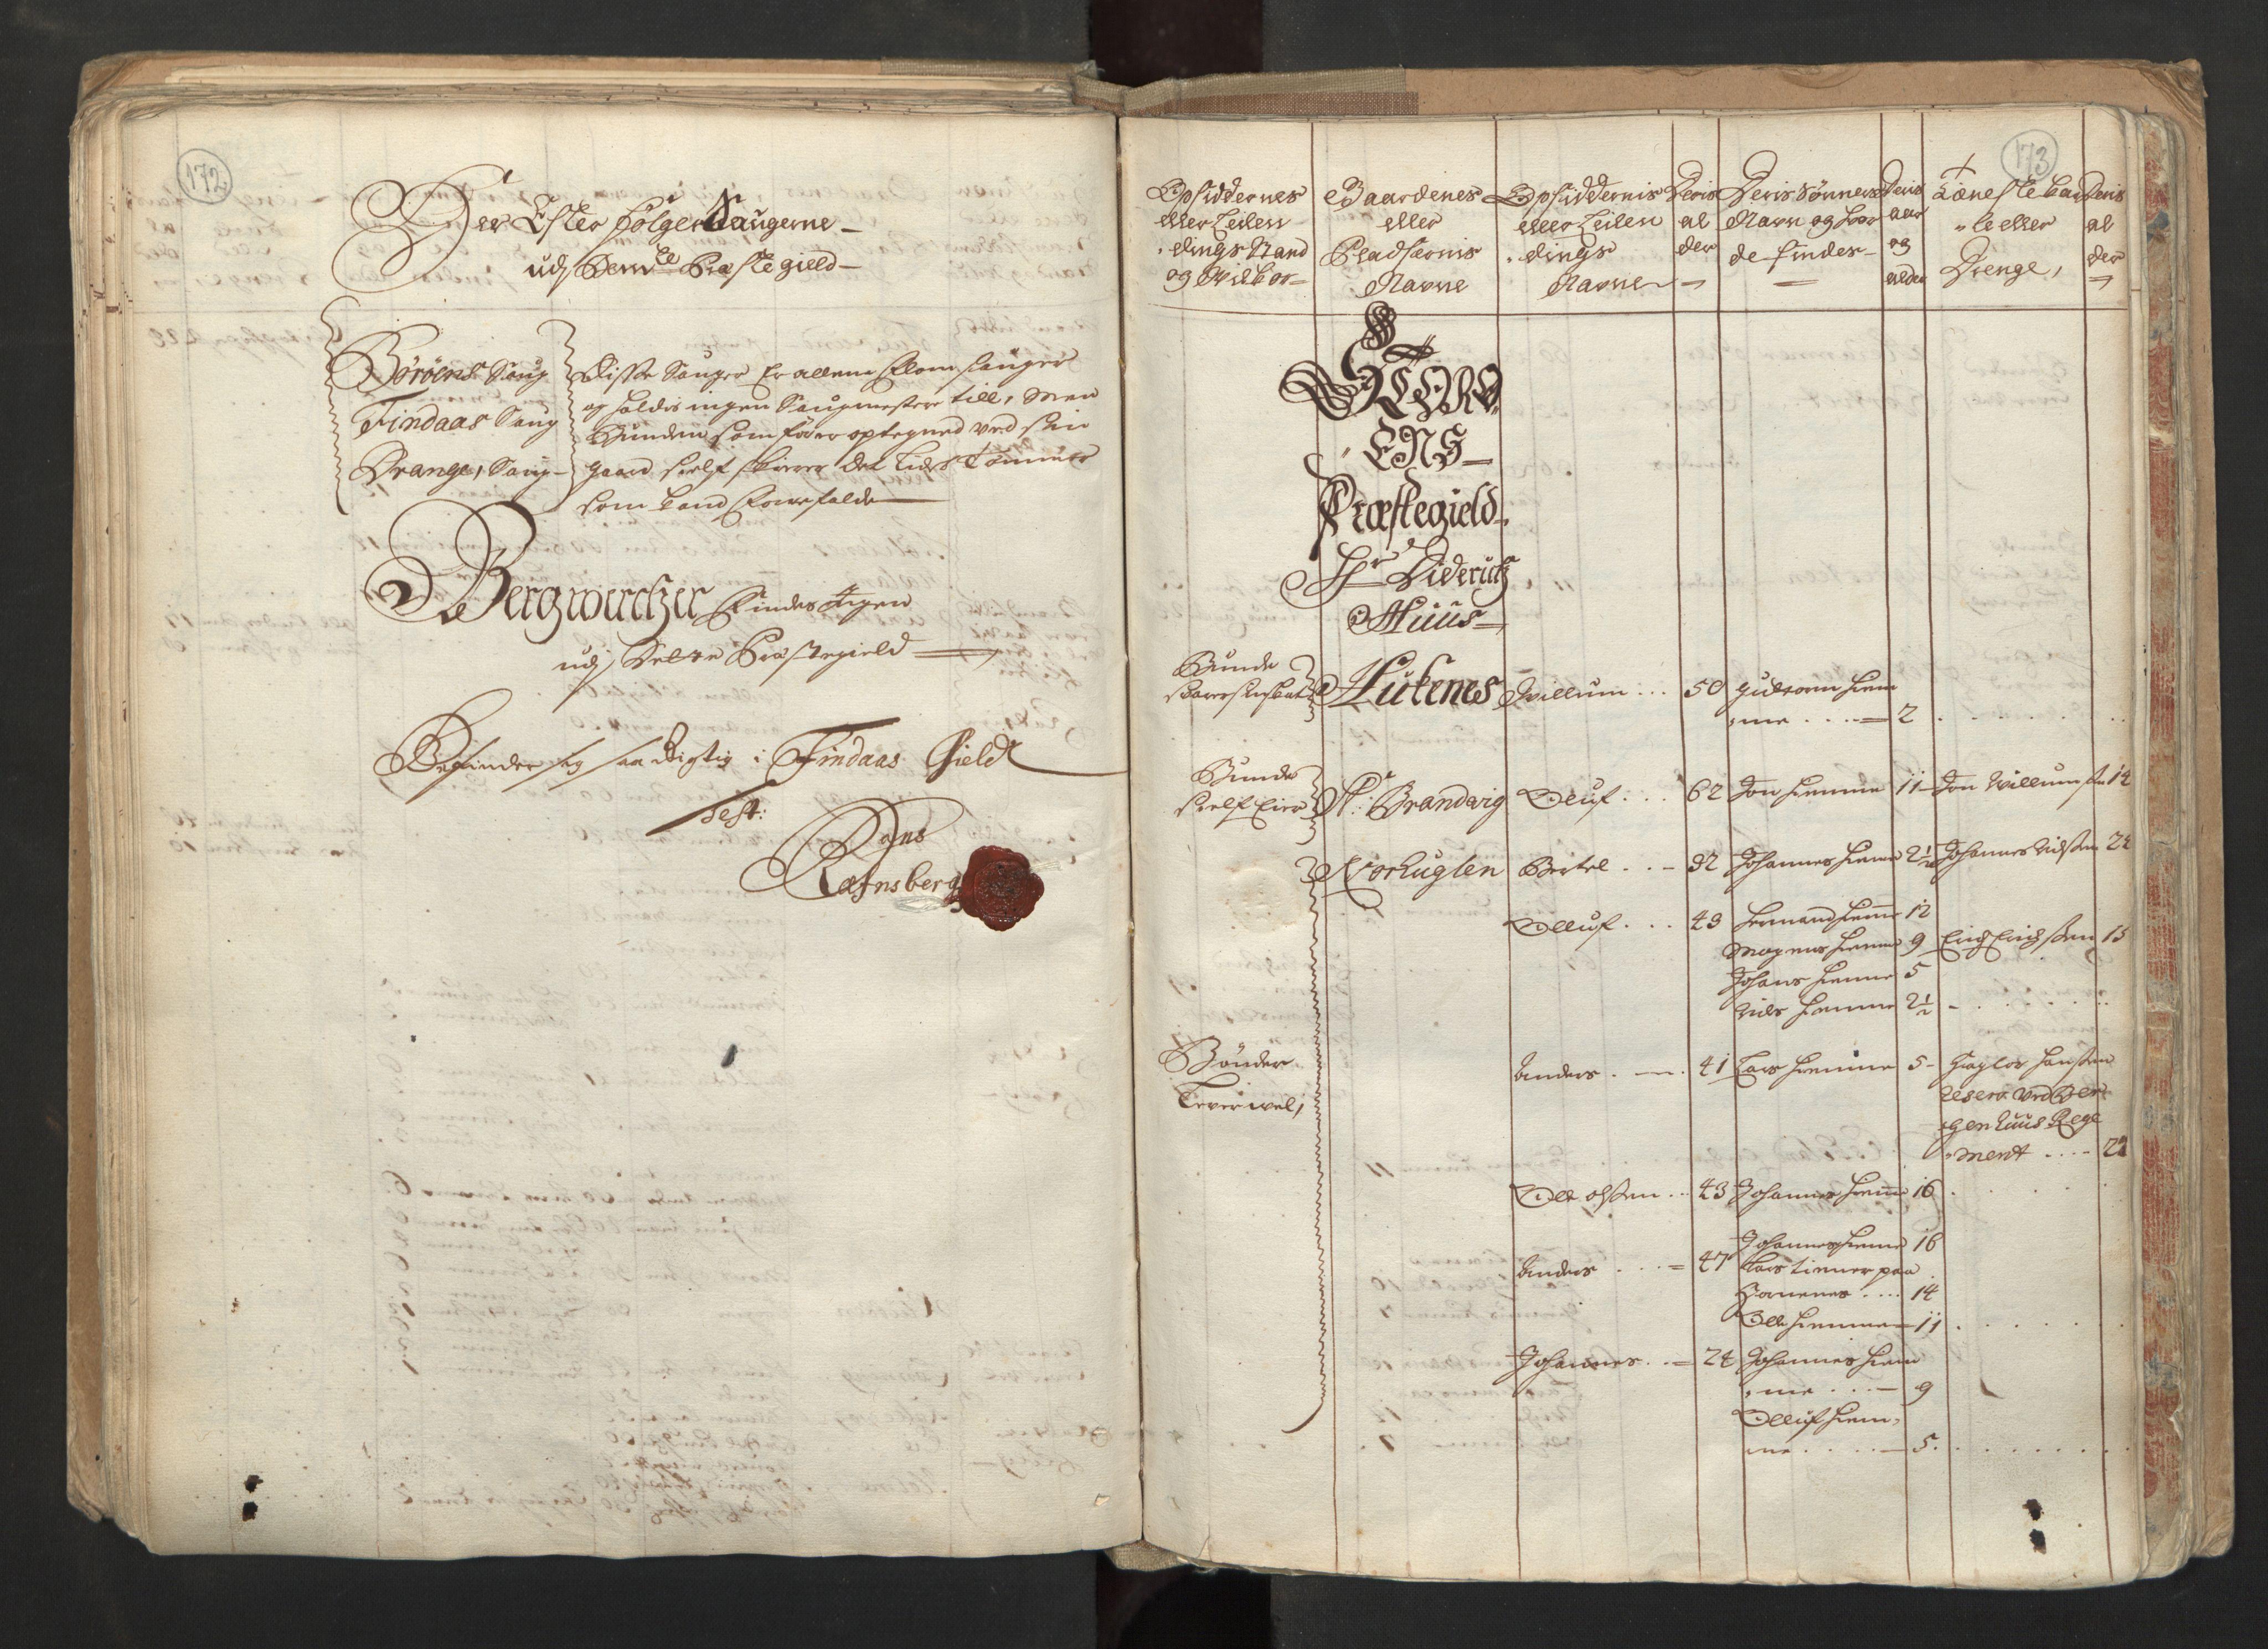 RA, Manntallet 1701, nr. 6: Sunnhordland fogderi og Hardanger fogderi, 1701, s. 172-173